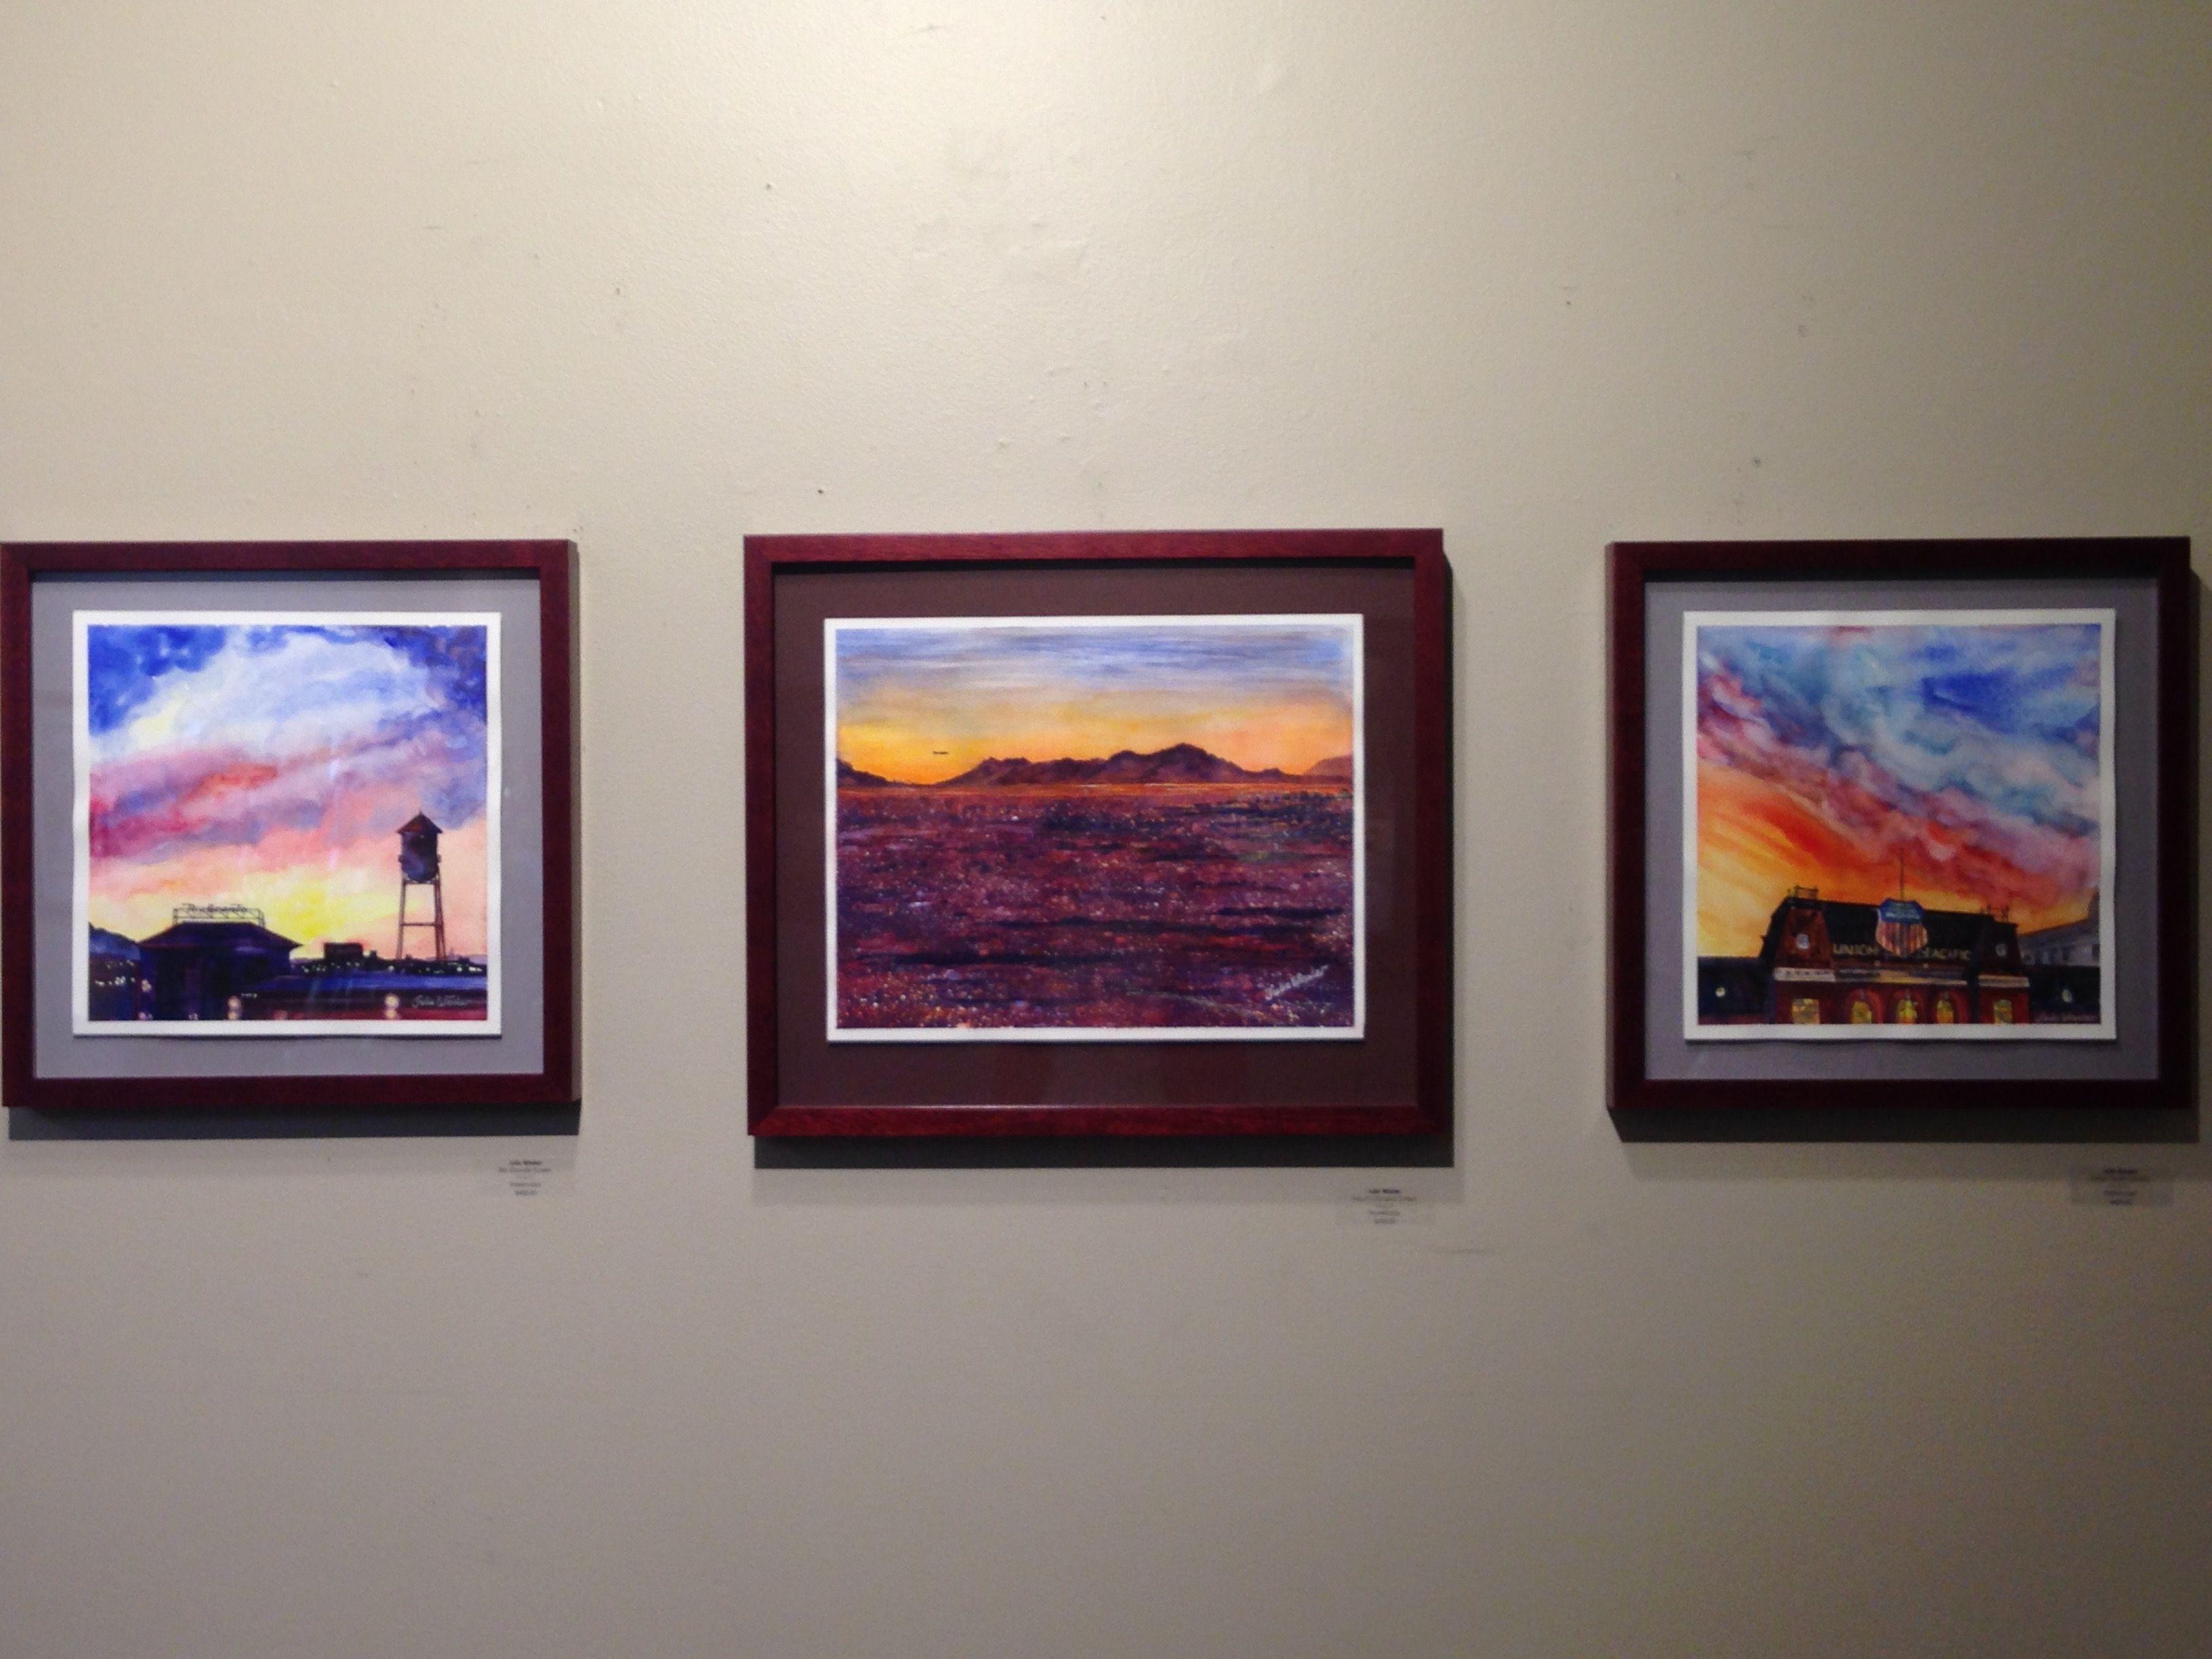 Original watercolor art for sale - Three Of My Original Watercolor Paintings Framed By Alpine Art In Salt Lake City Utah